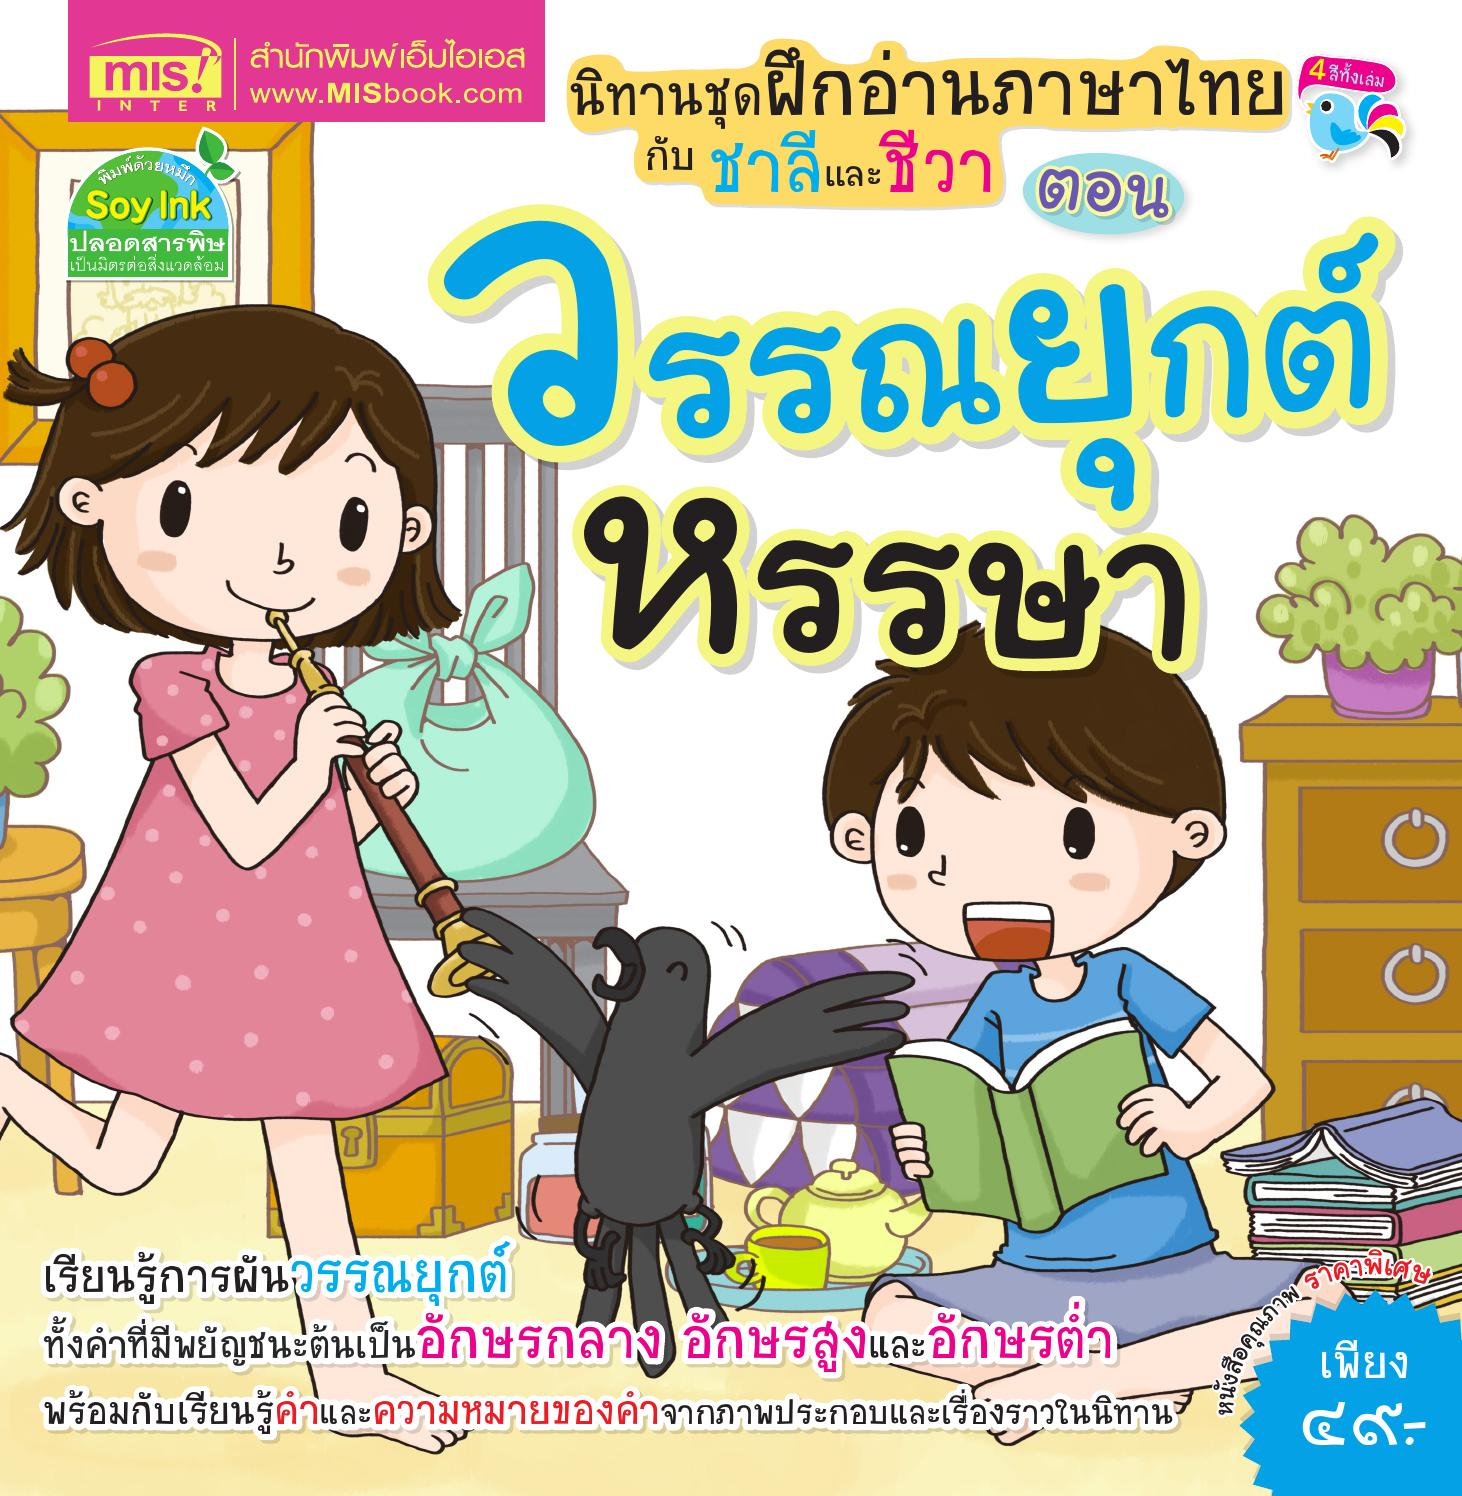 ��r��N�_นิทานชุดฝึกอ่านภาษาไทยกับ